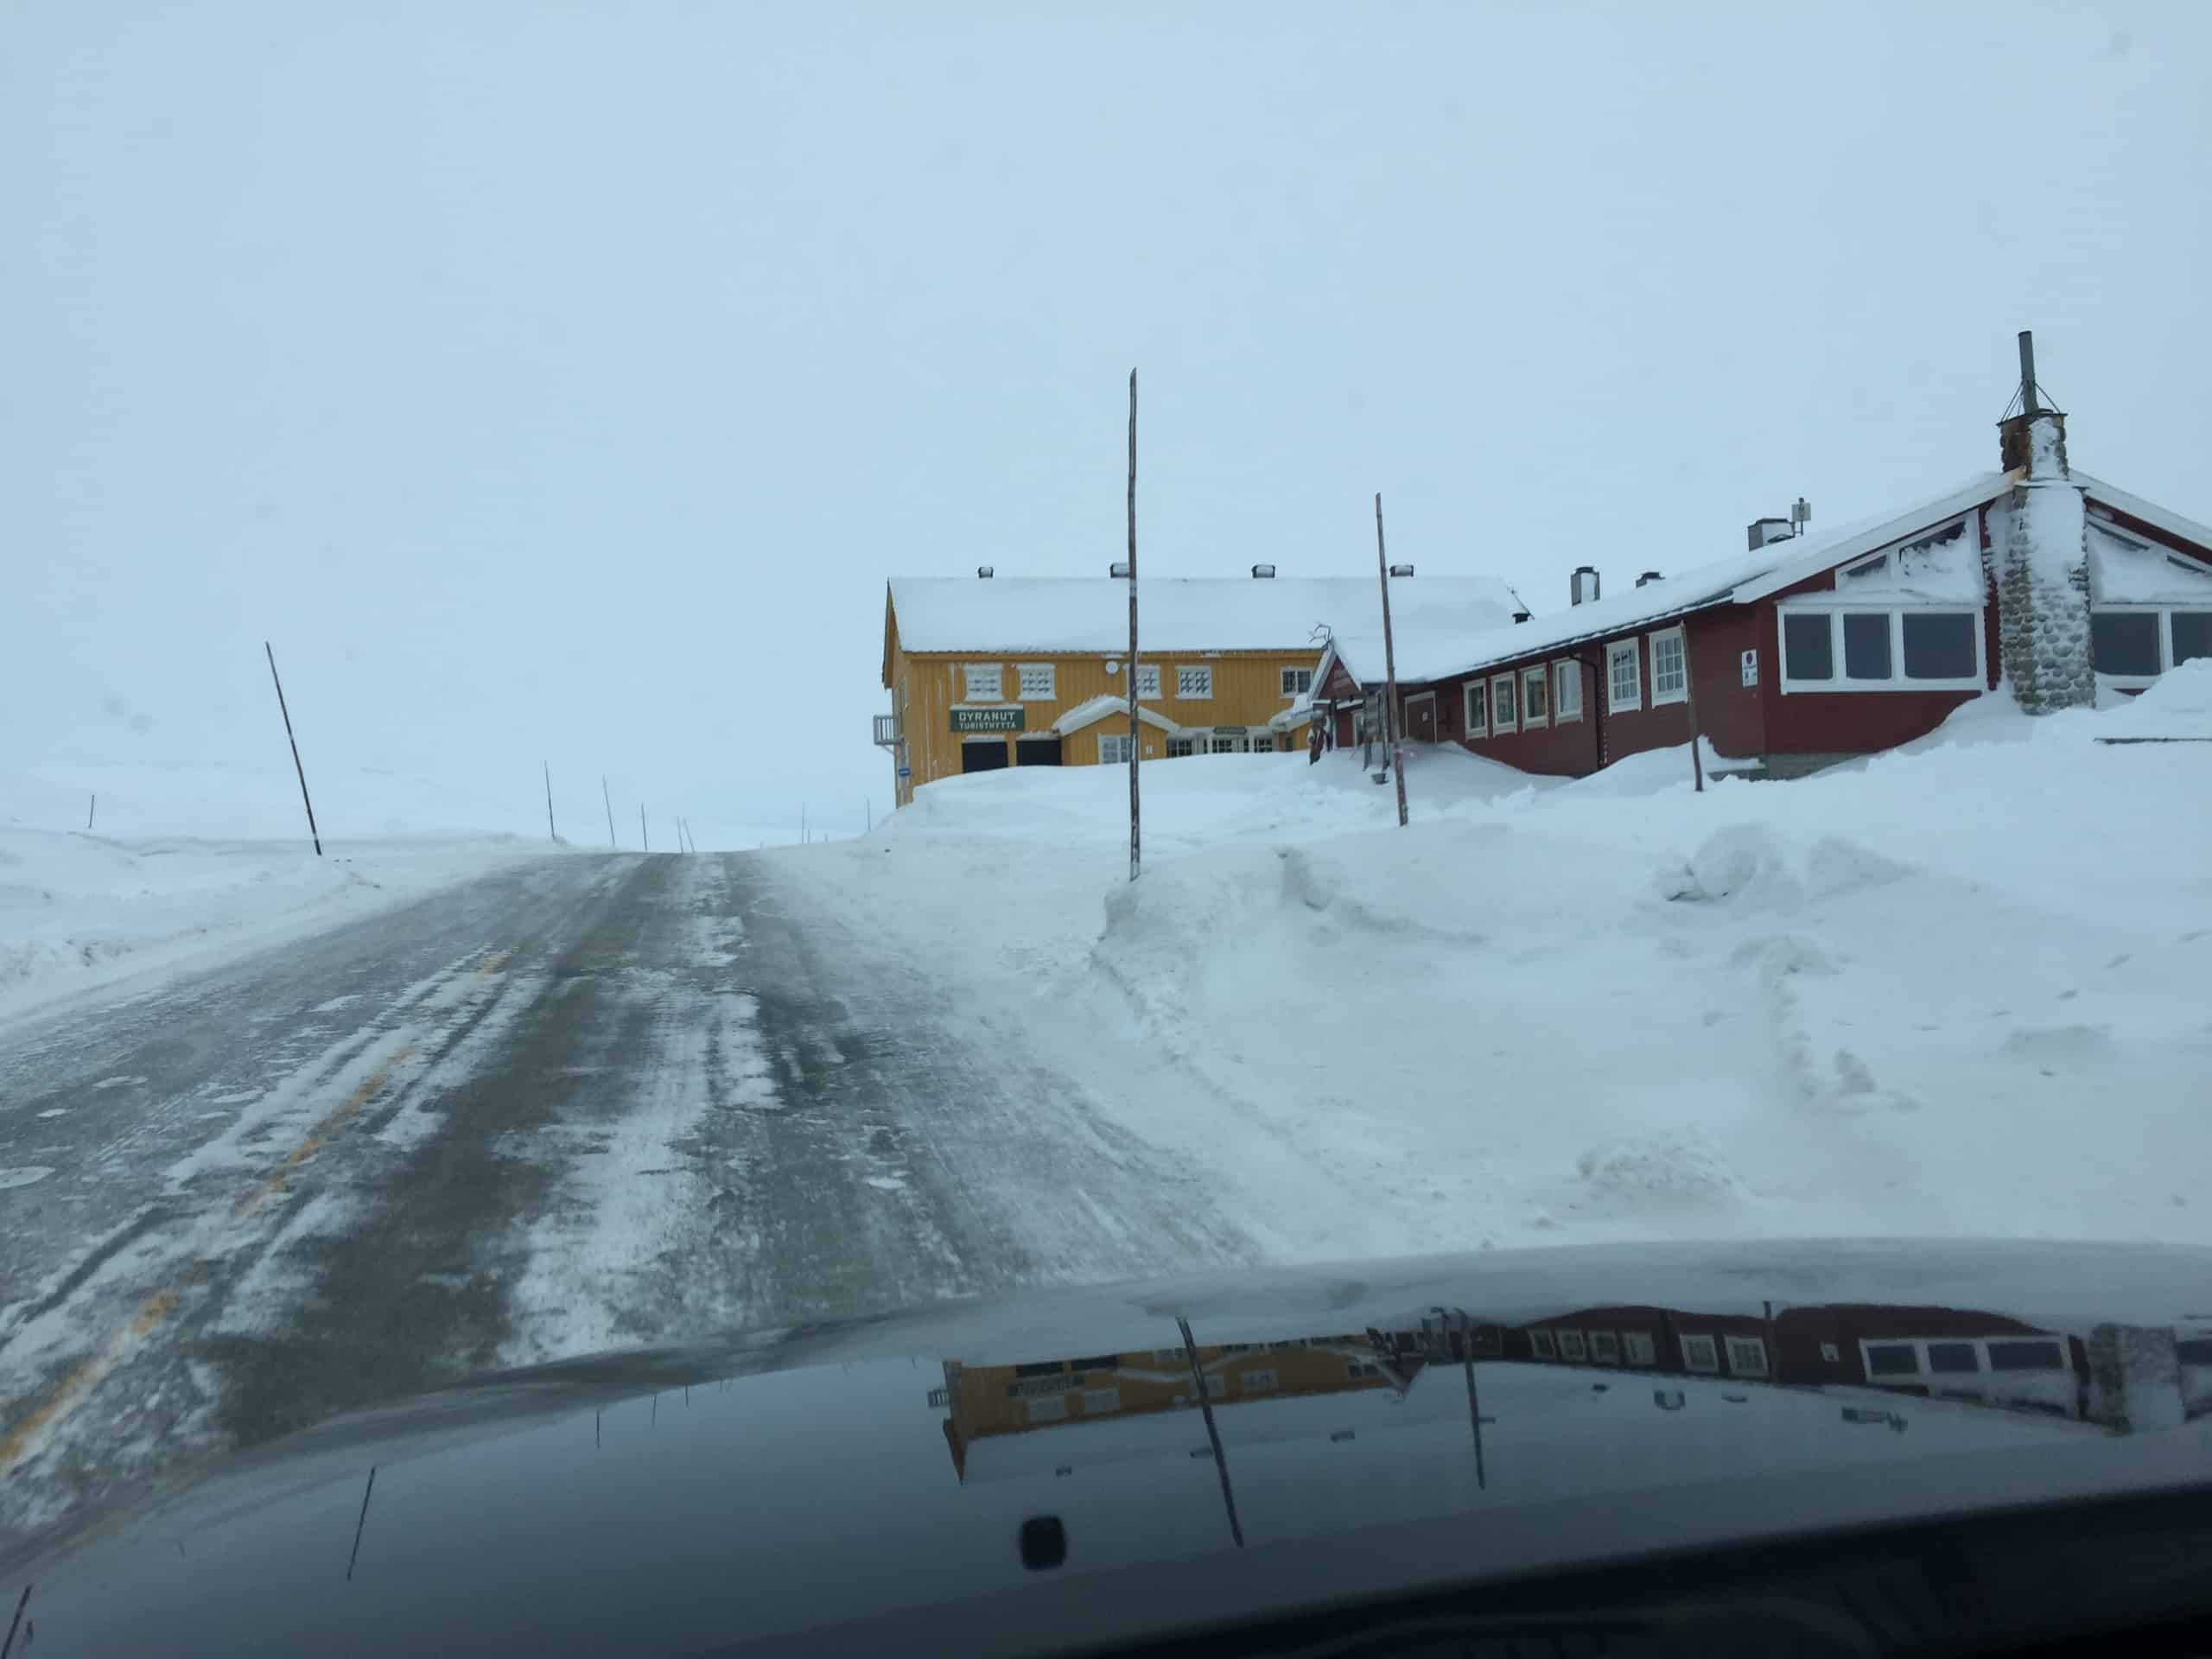 Semje om å arbeida for korte tunnelar på Hardangervidda